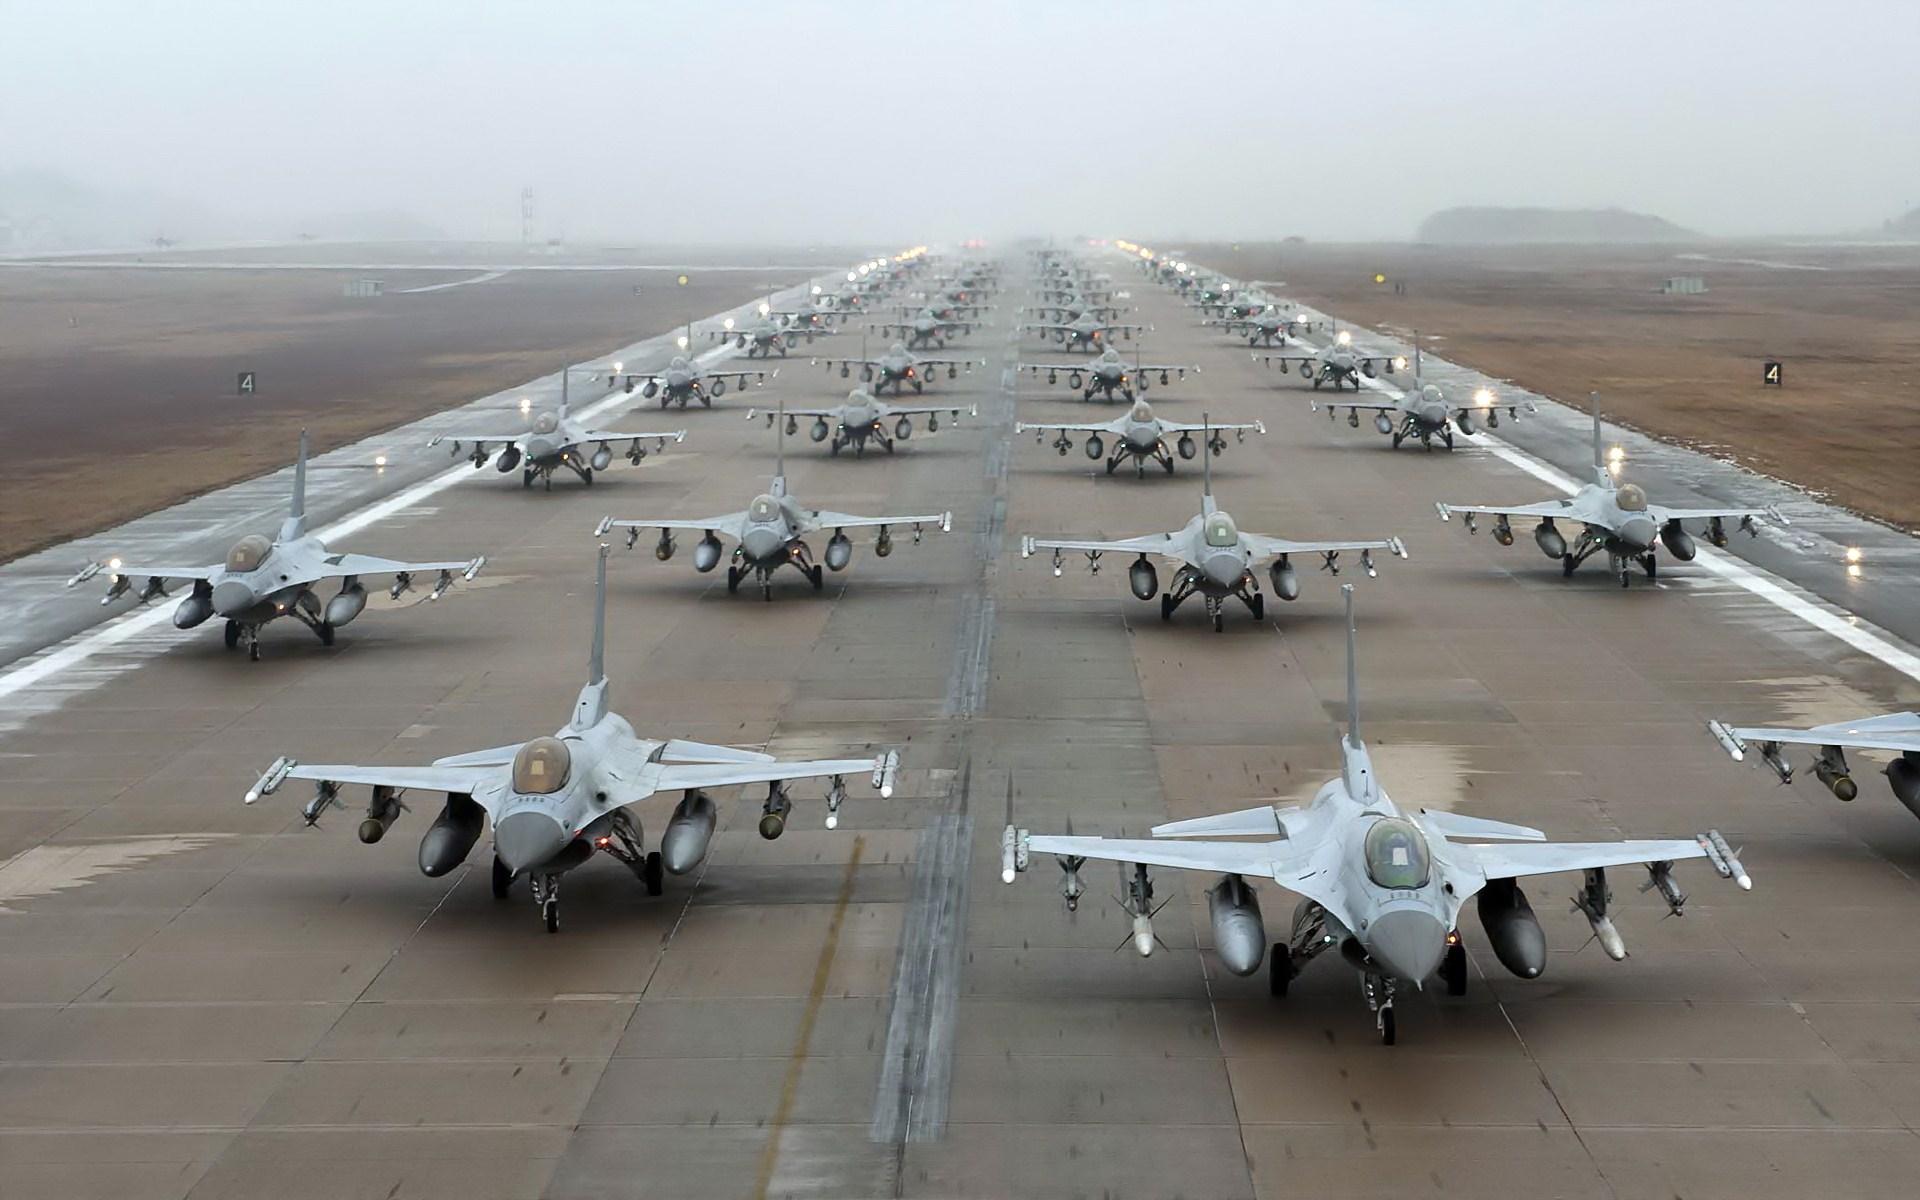 General Dynamics F 16 Fighting Falcon Hd Wallpaper: General Dynamics F-16 Fighting Falcon HD Wallpaper